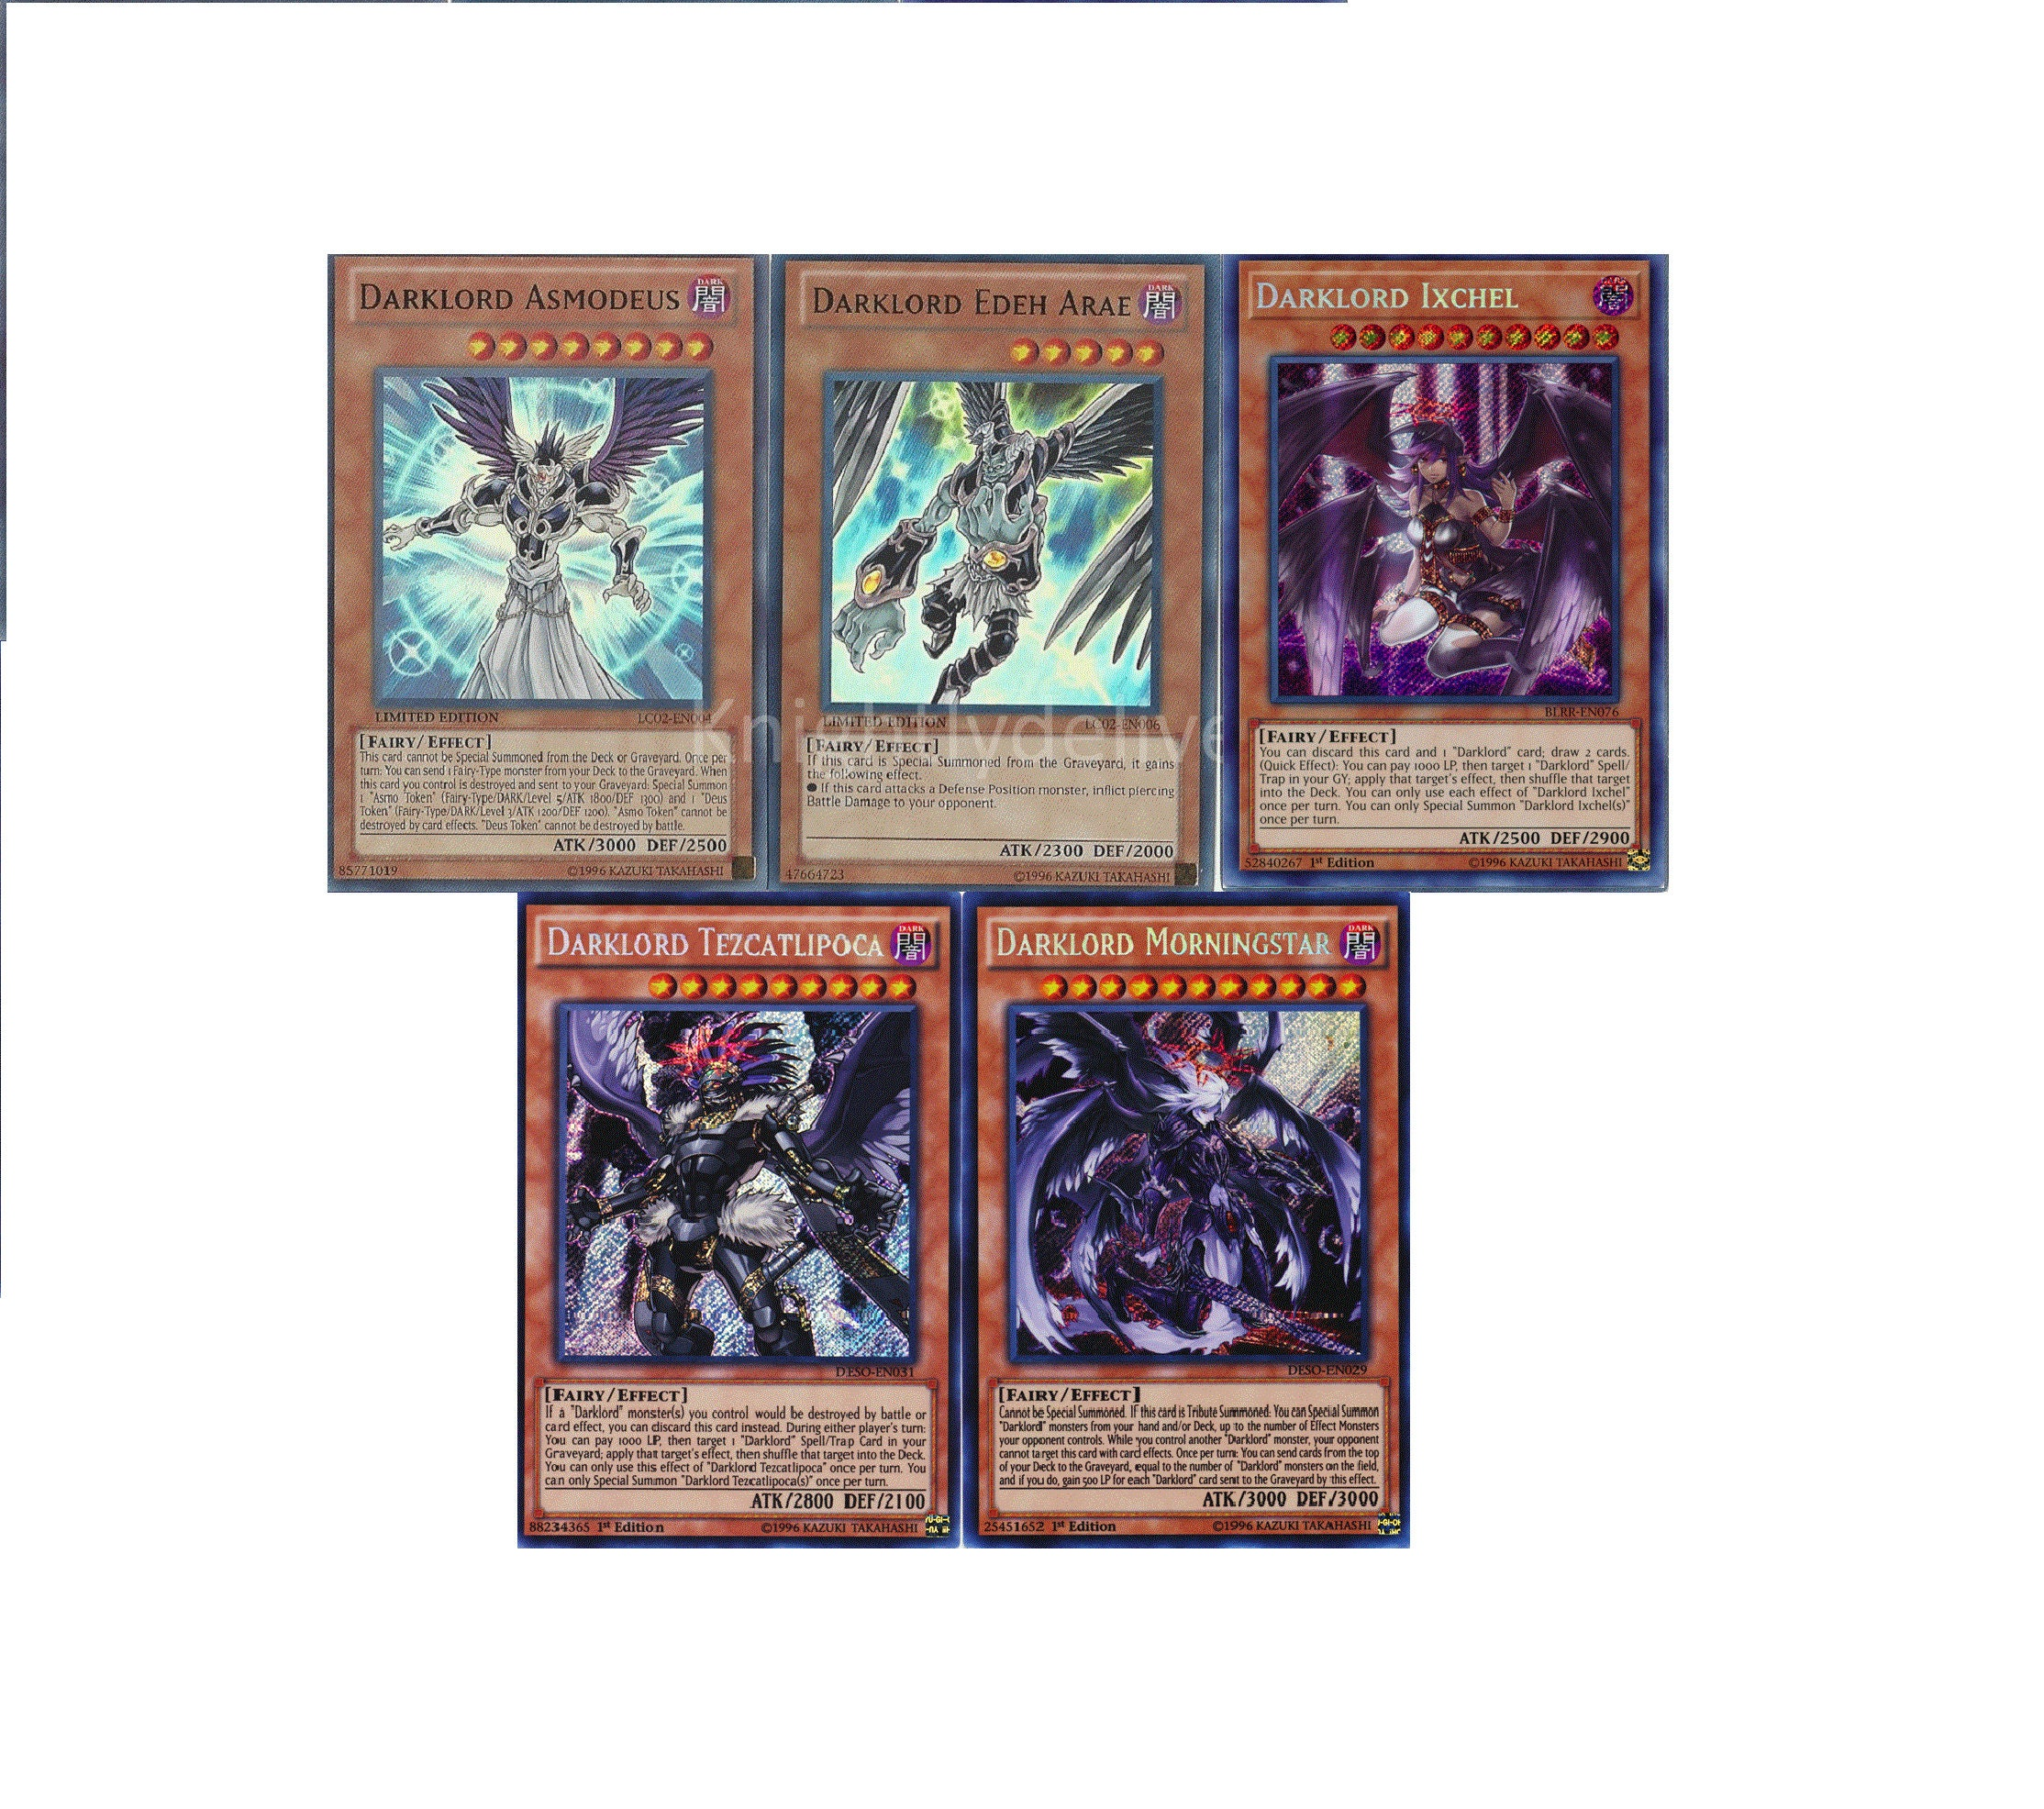 Darklord Fairy Budget Deck - Ixchel - Nasten - Tezcatlipoca - 43 Cards - NM  - Yugioh